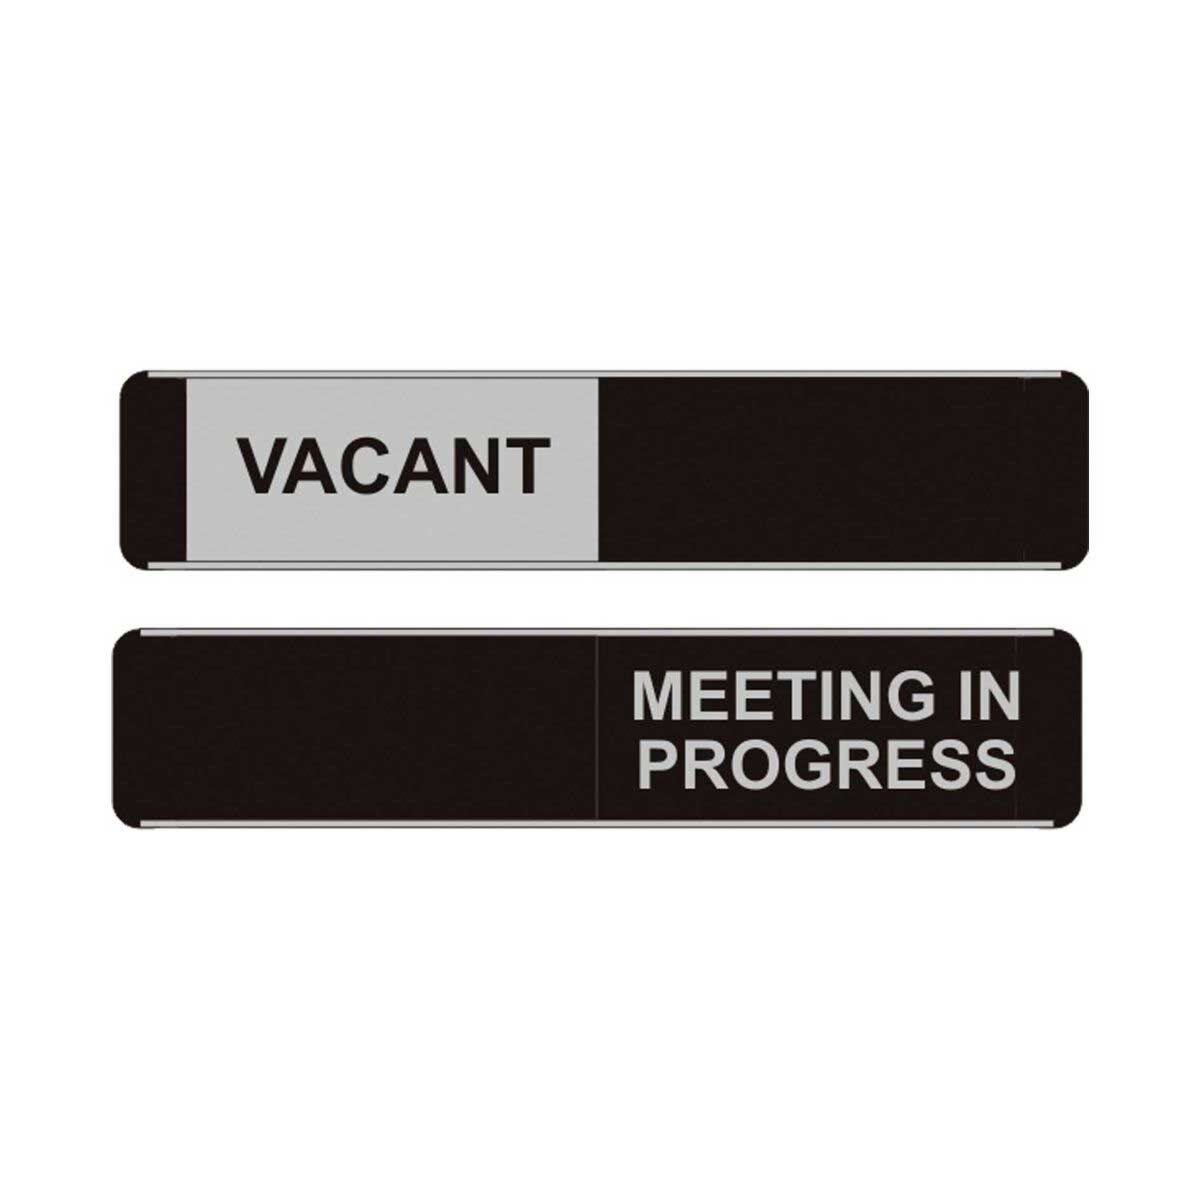 Vacant/Meeting in Progress Stylish Sliding Sign Alum PVC